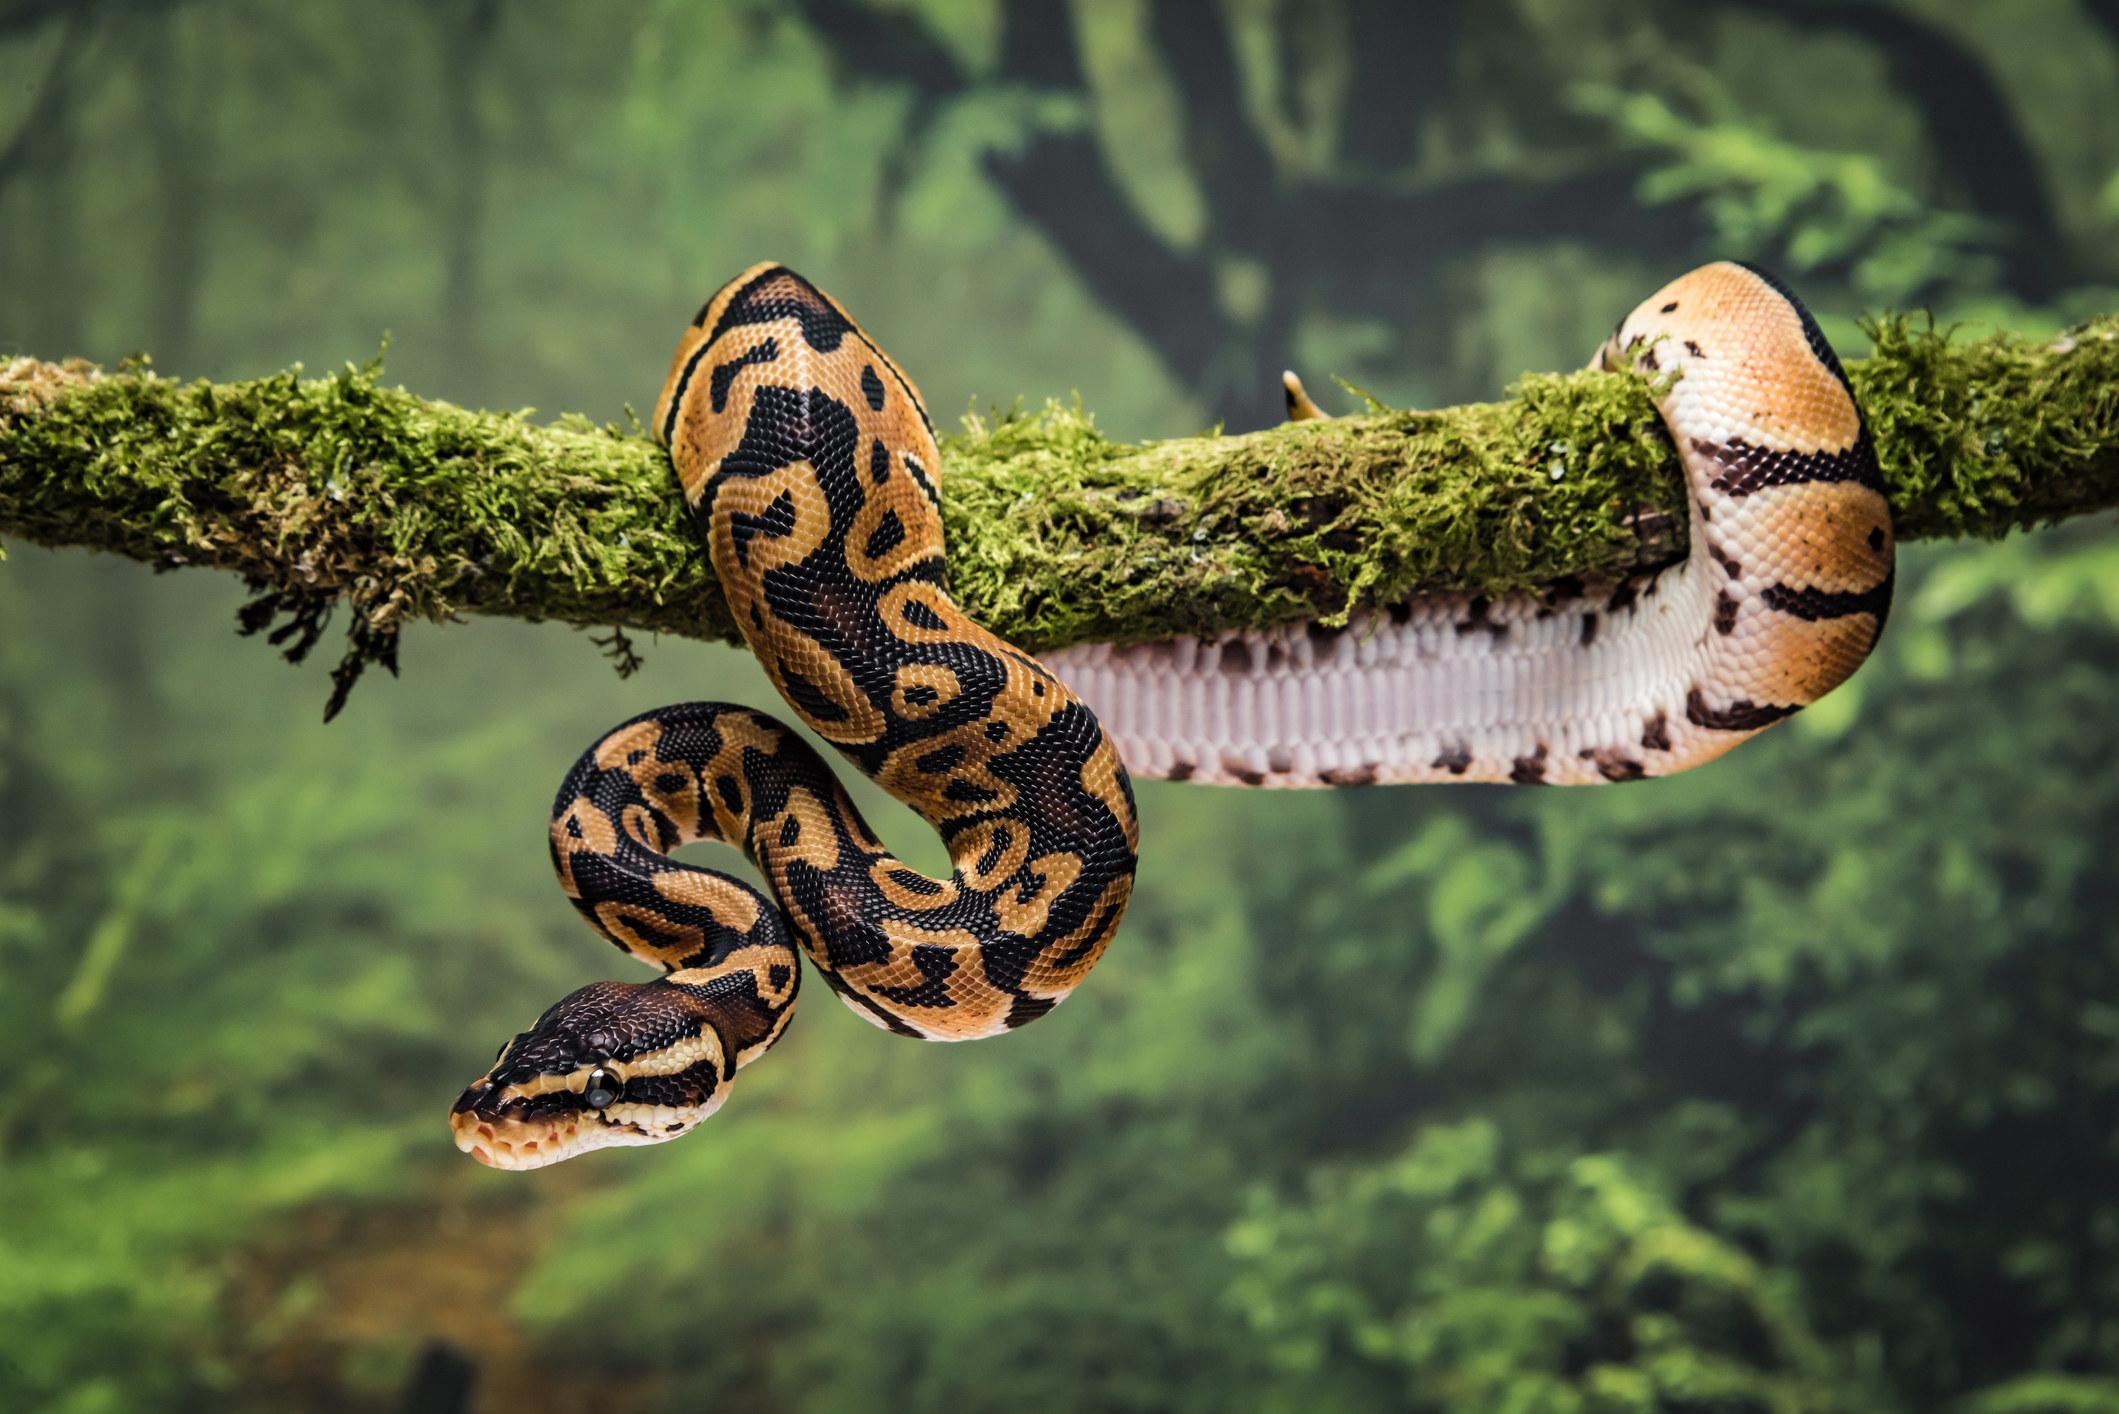 A python coiled around a branch